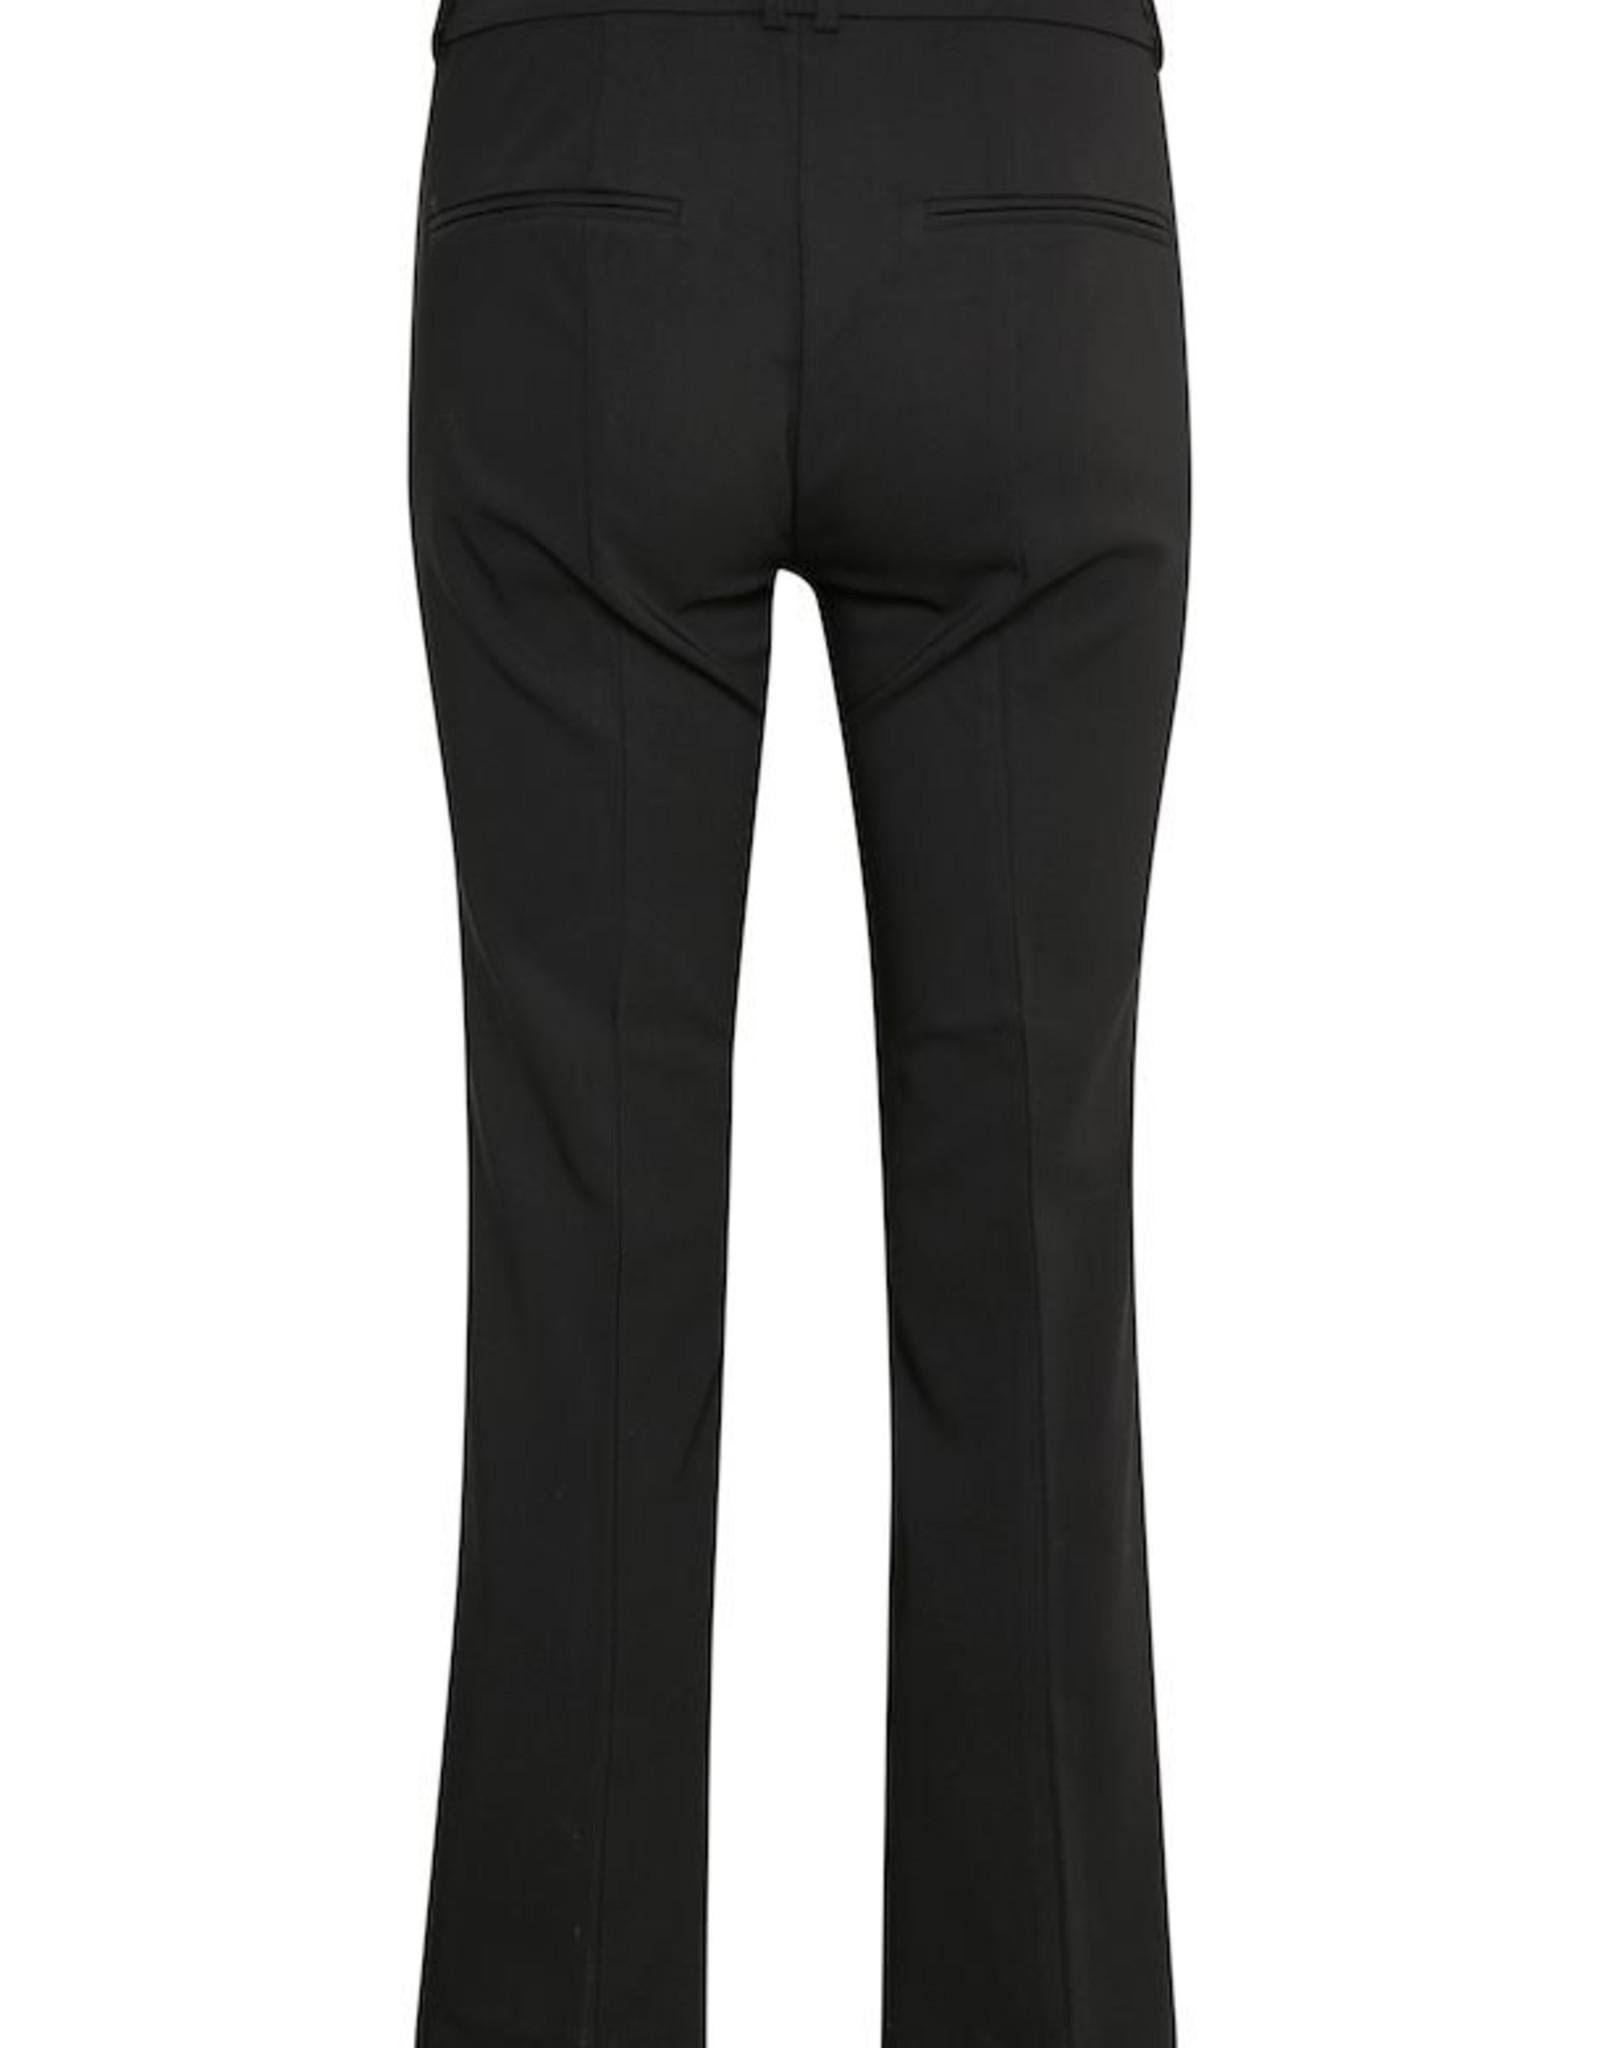 InWear Zella Kickflare Pant Black